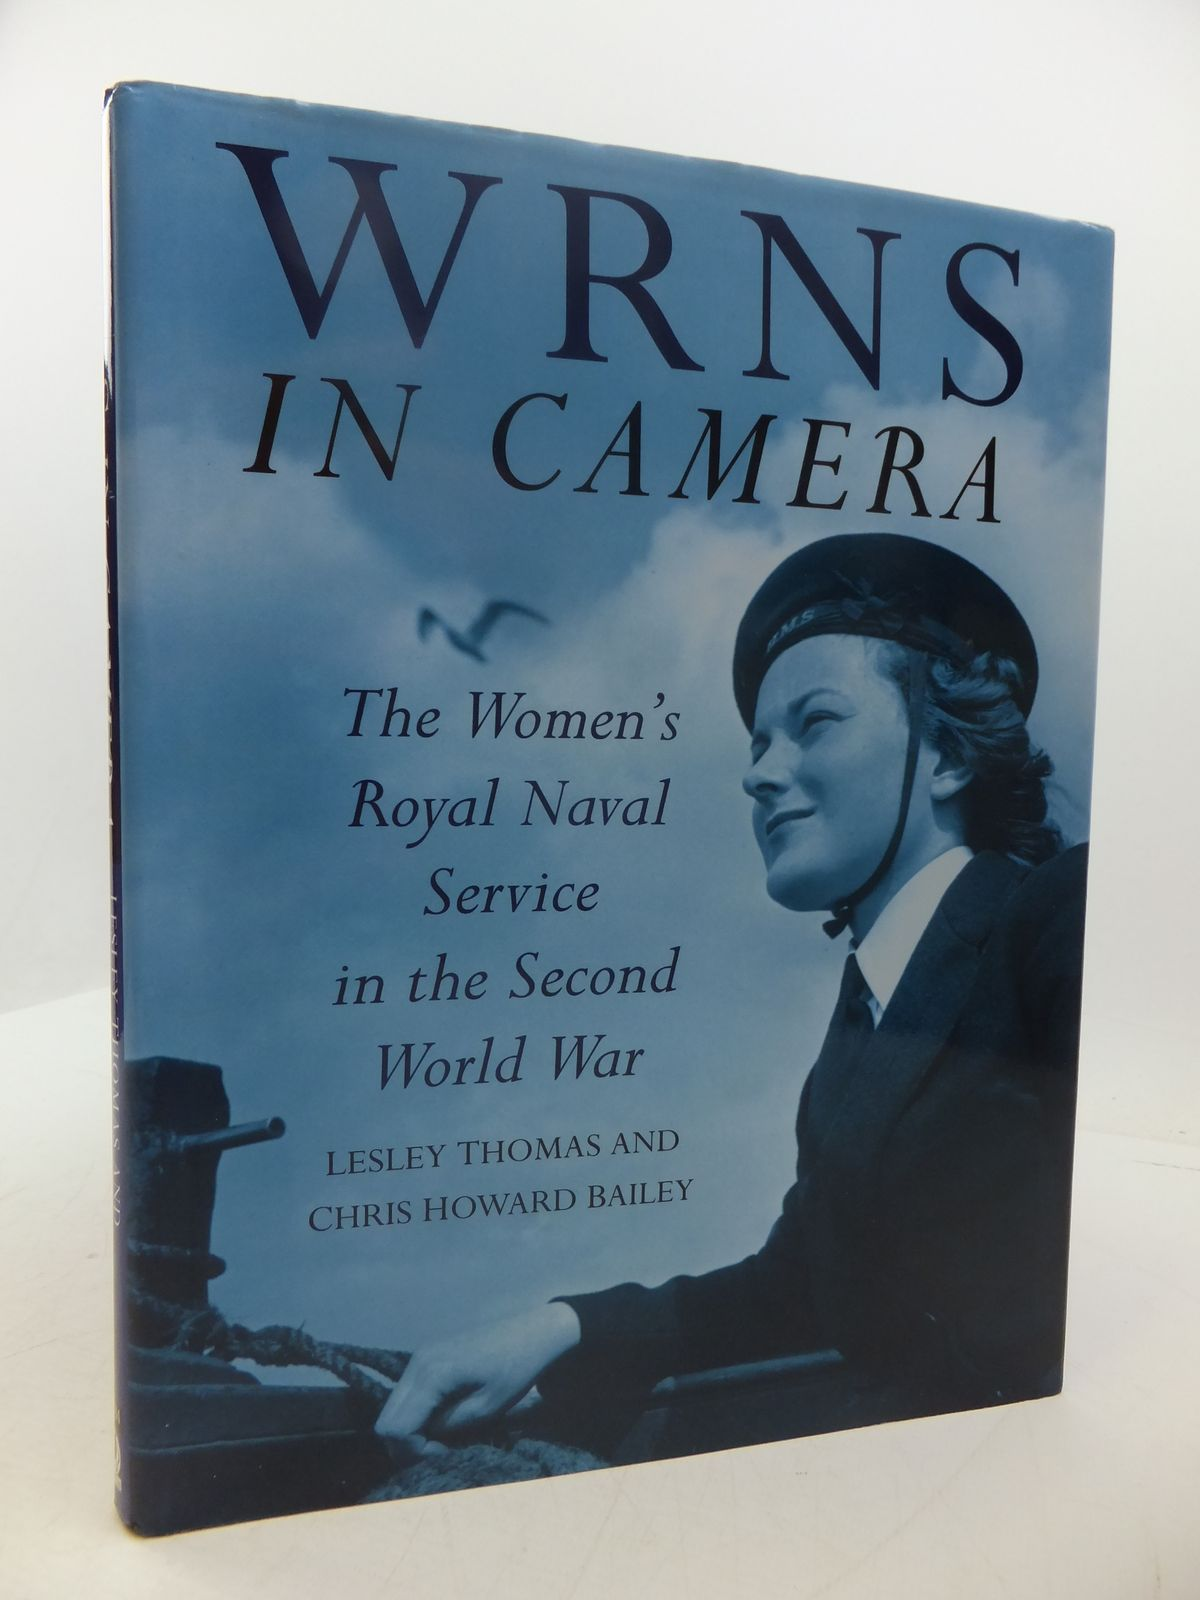 WRNS in Camera